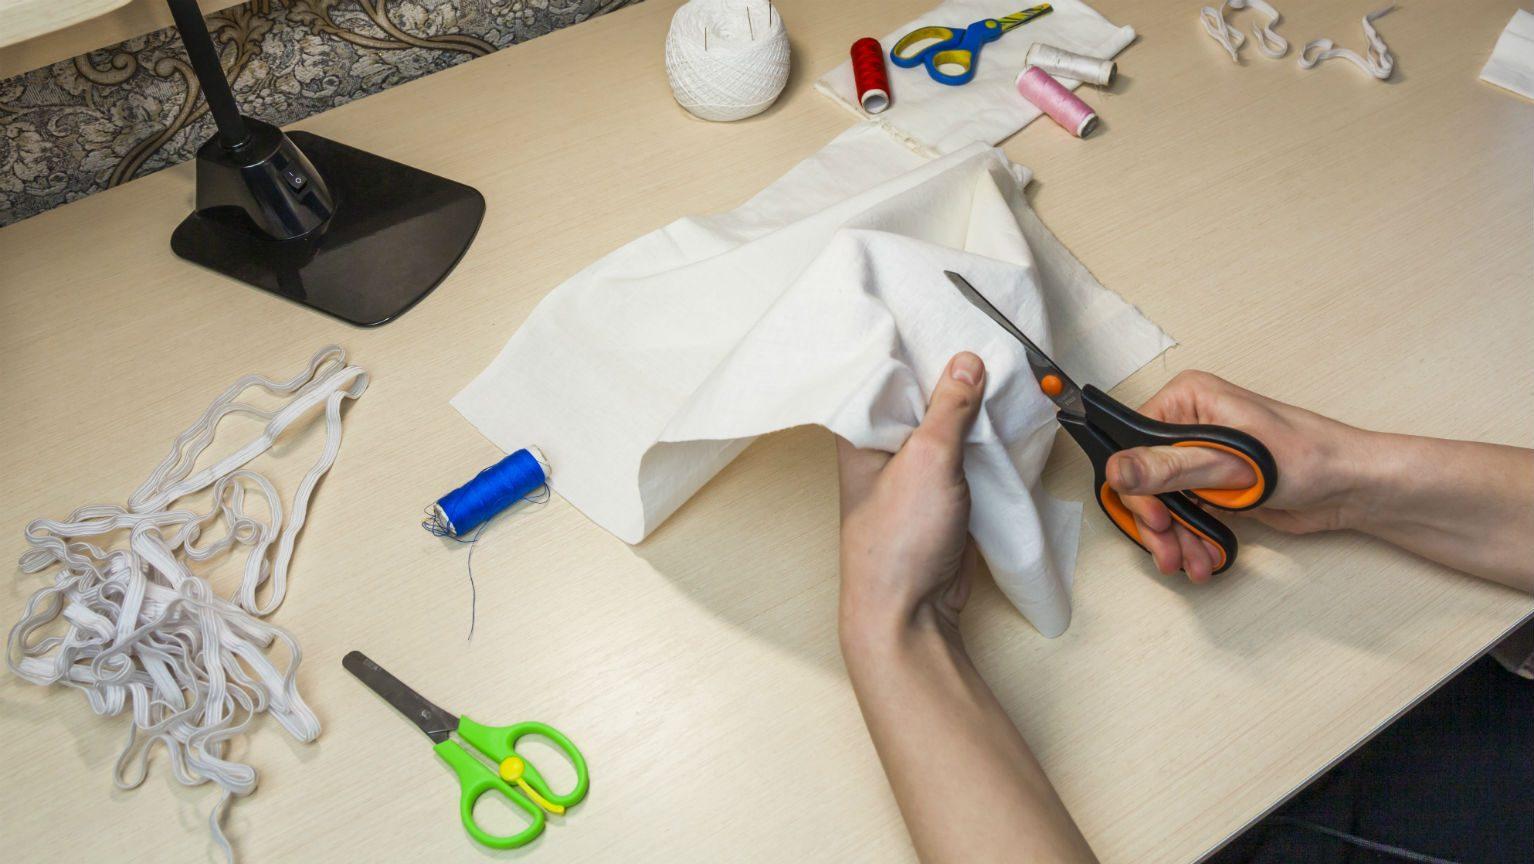 Person cutting cloth